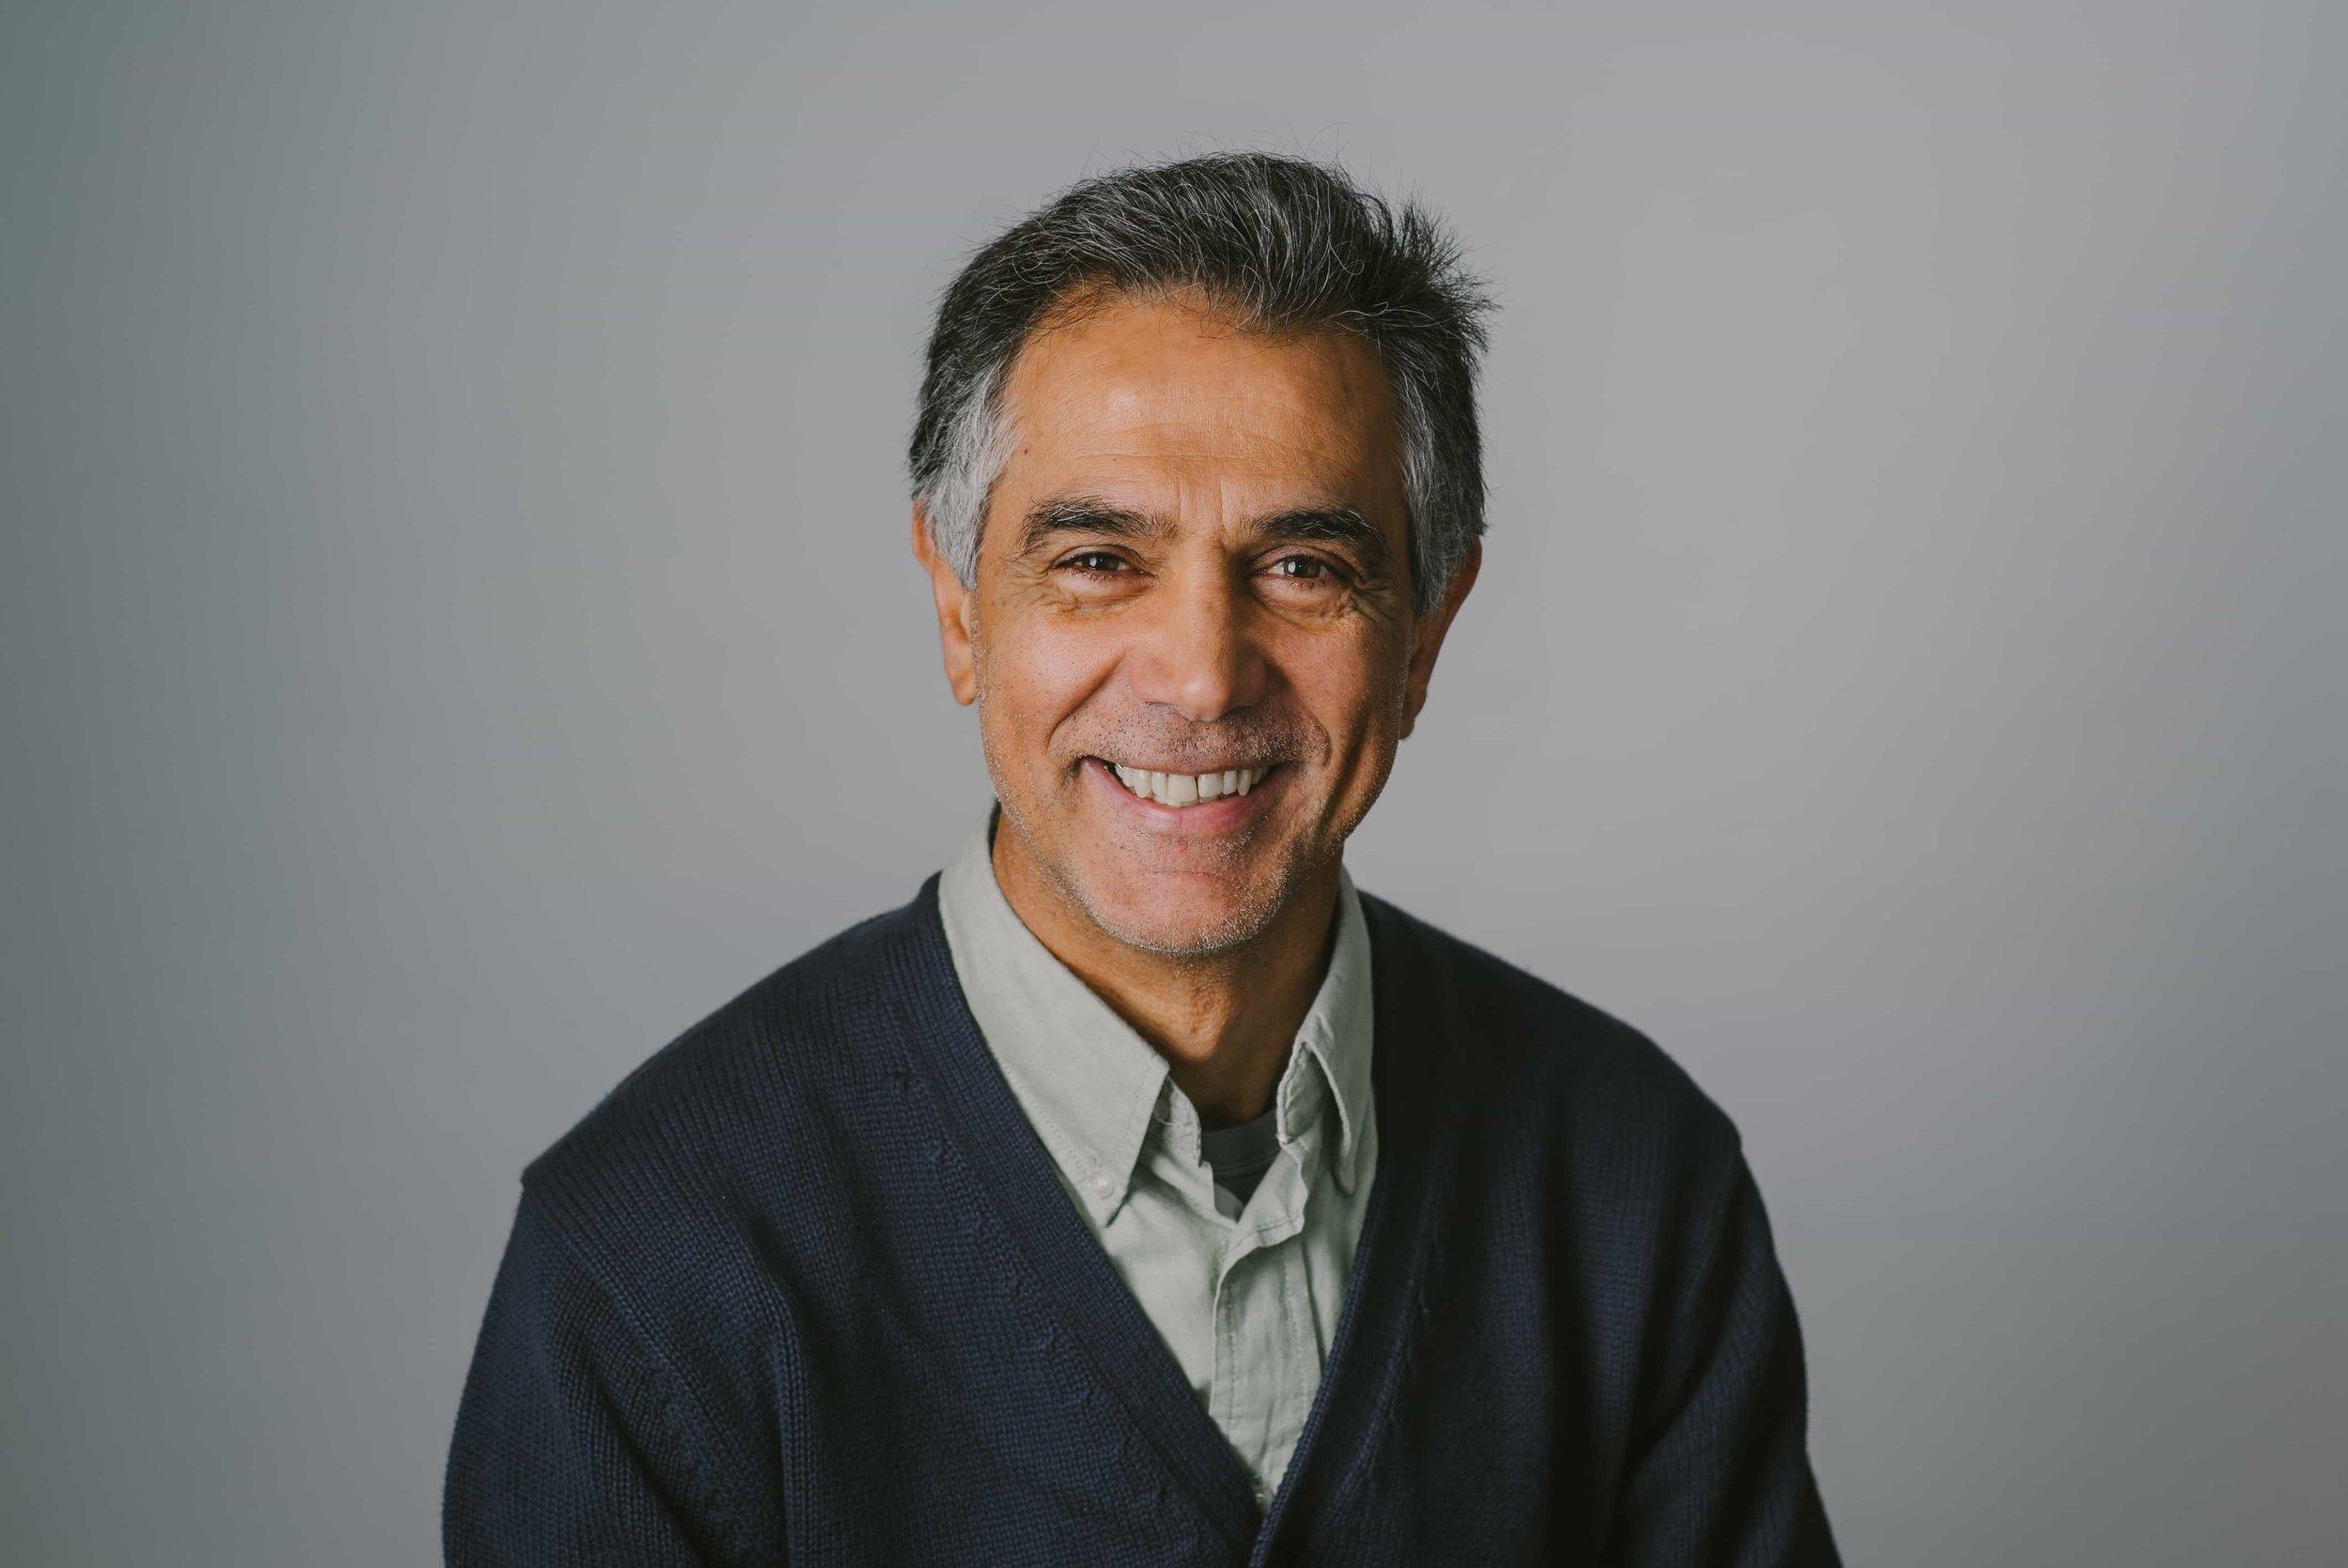 Carmine Posillico